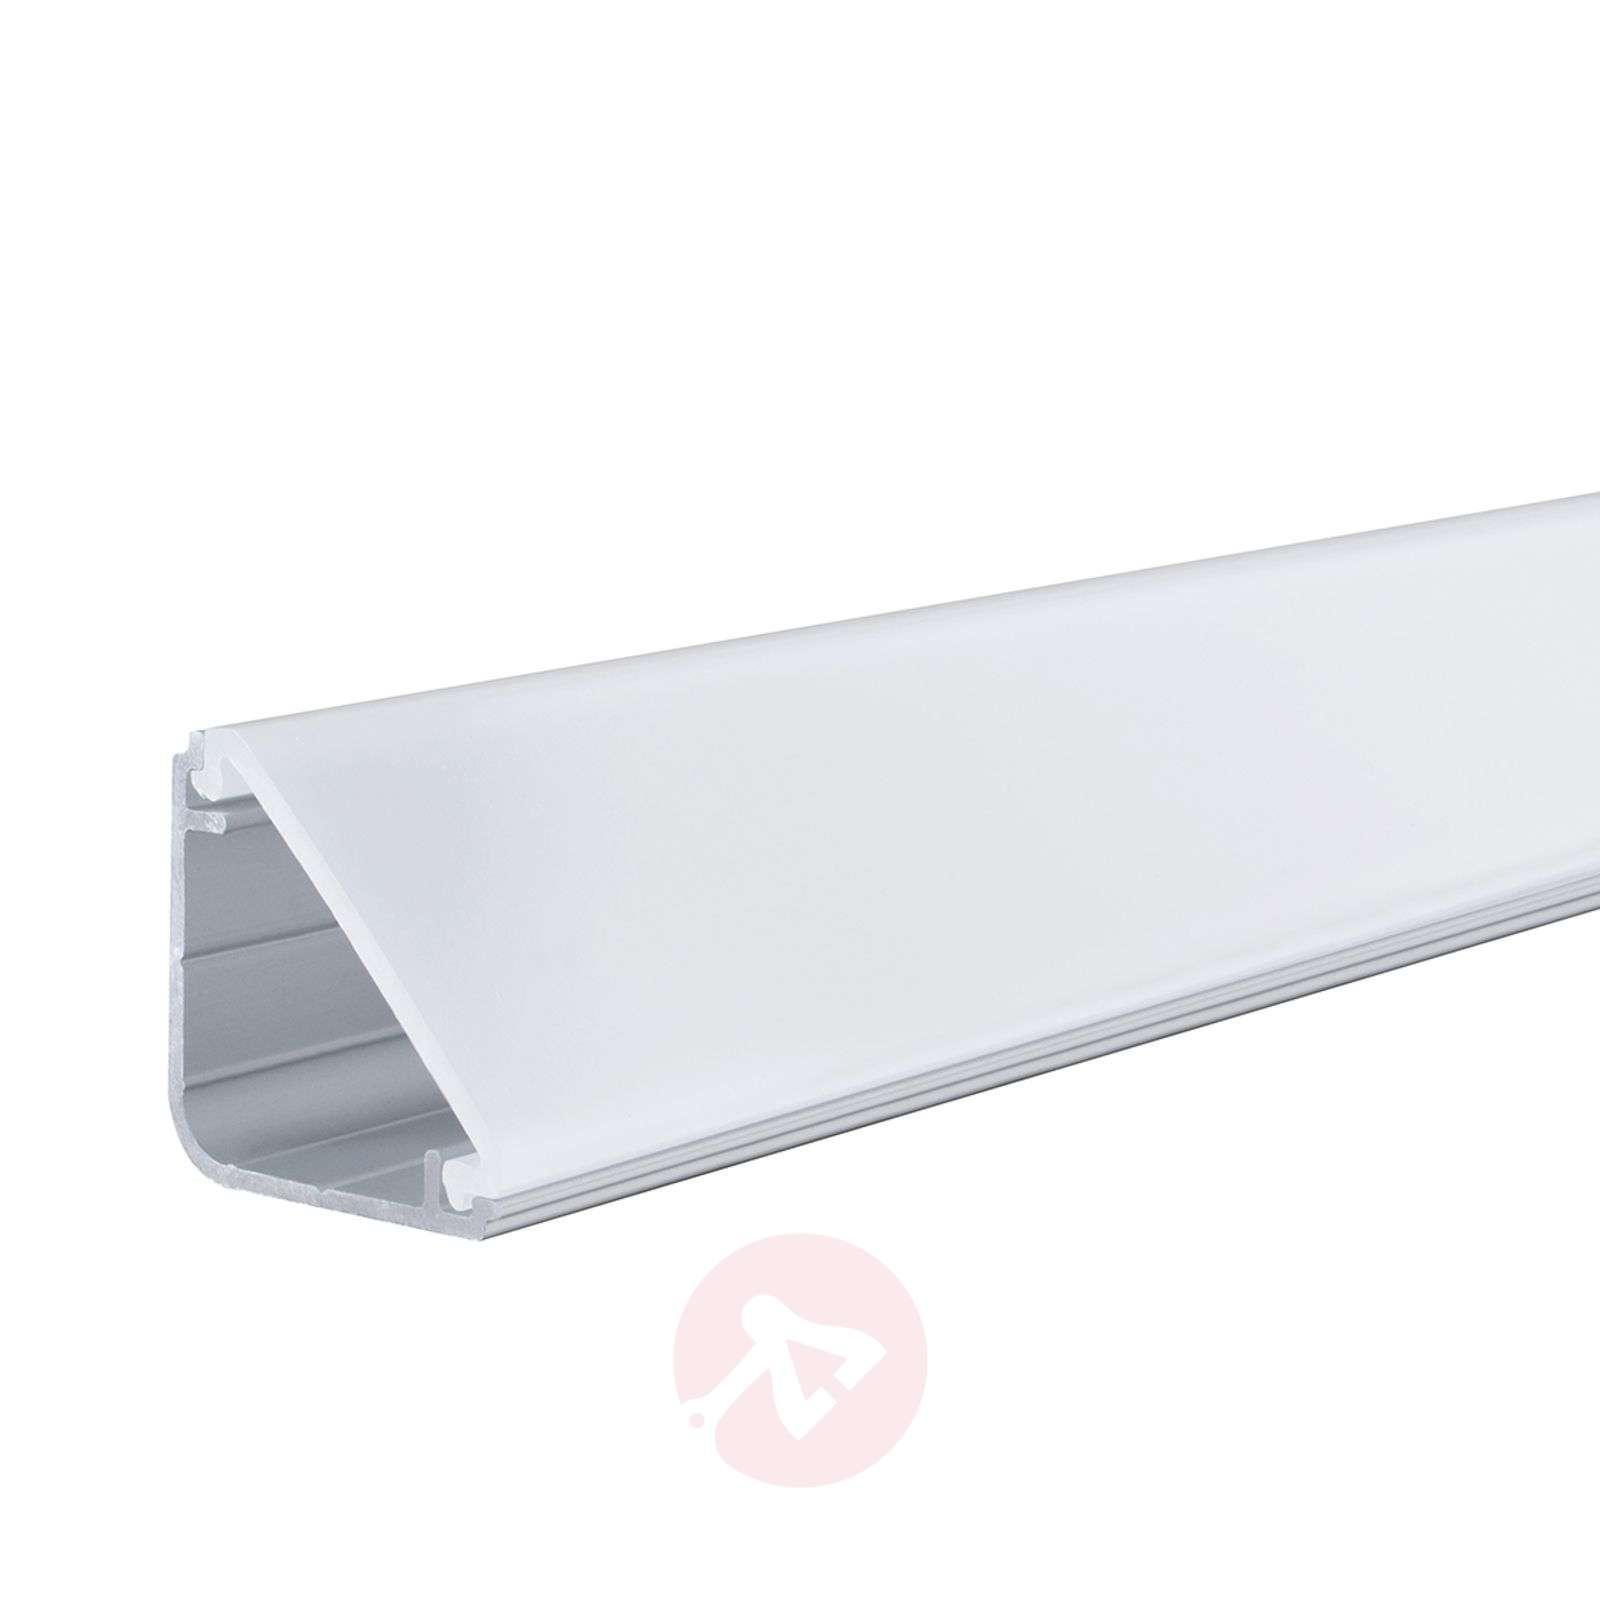 Delta profile for Caja LED strip system, 2 m-7600701-01